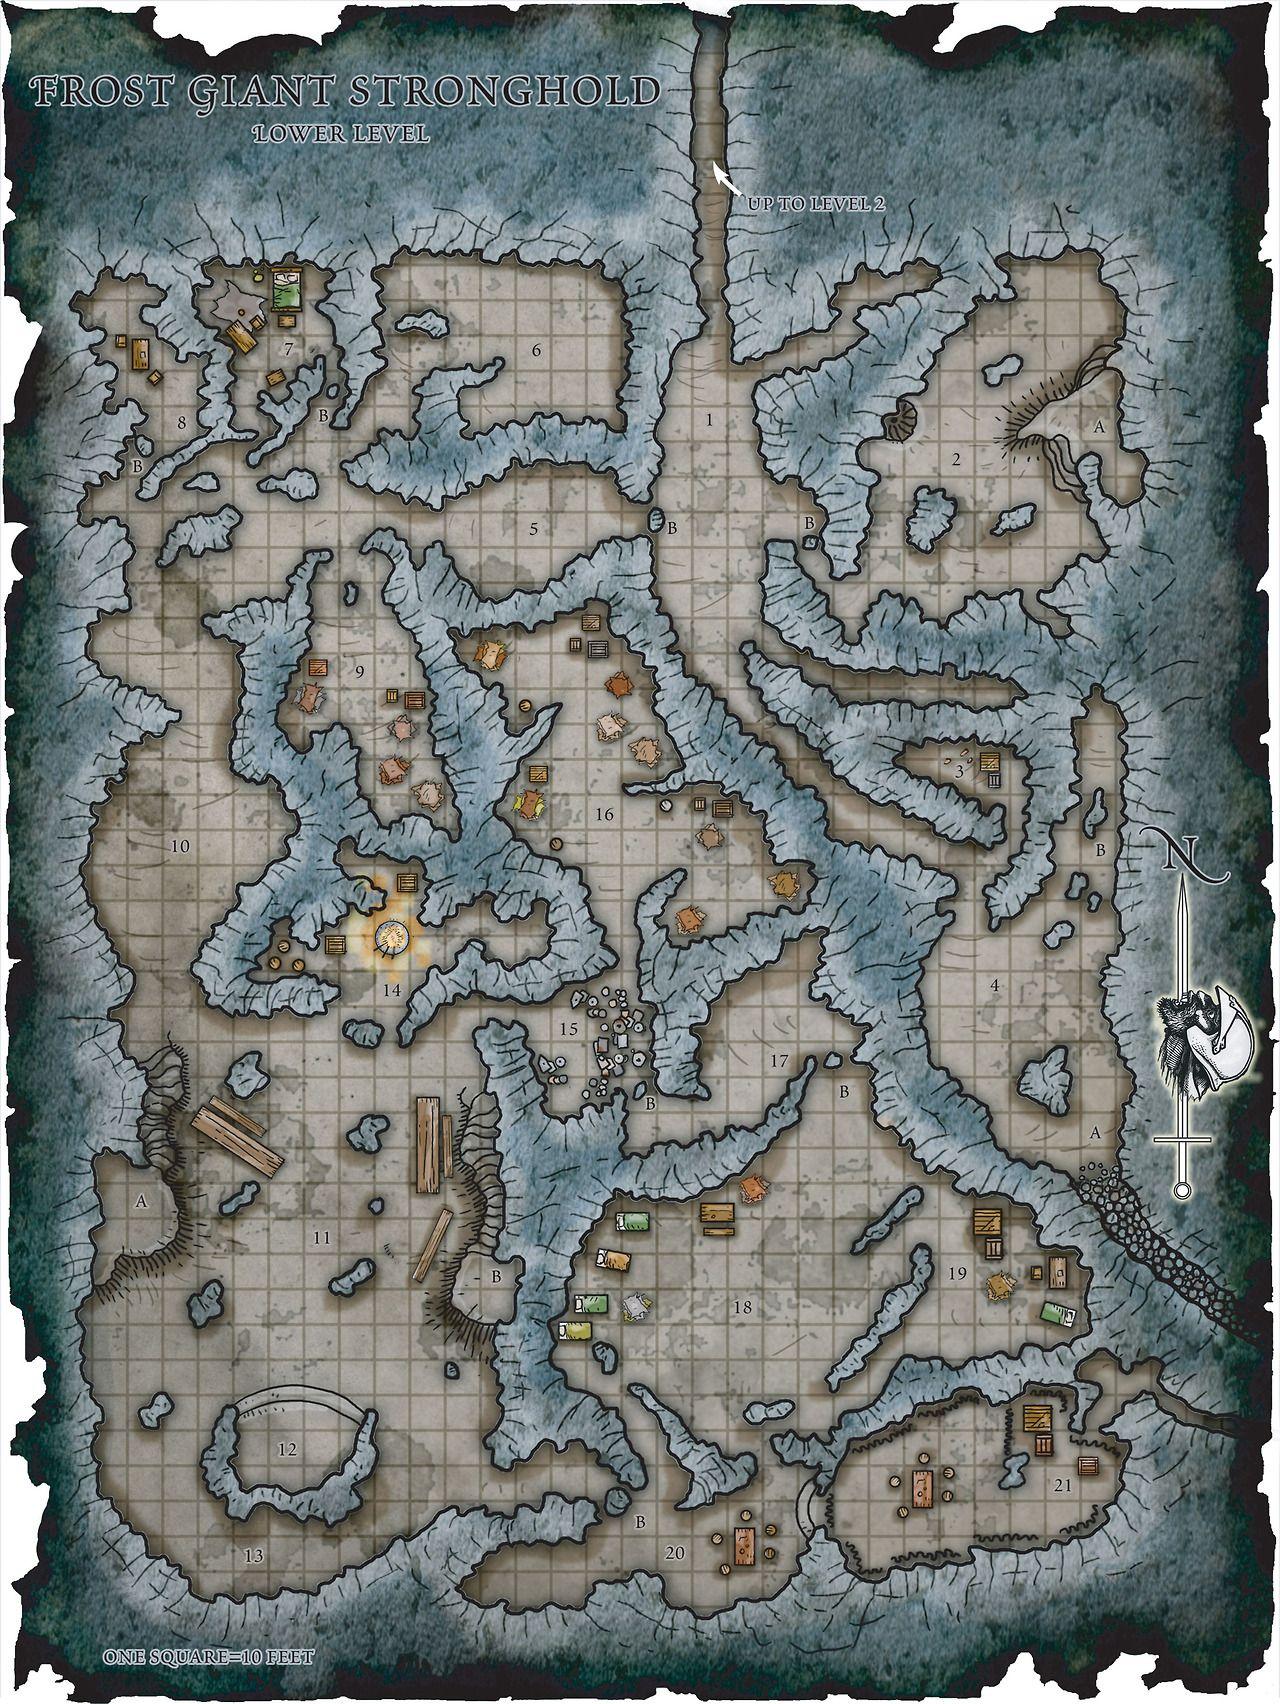 How To Get The Giant Bonus Map : giant, bonus, Glenn, Wallace, Fantasy, Dungeon, Maps,, Tabletop